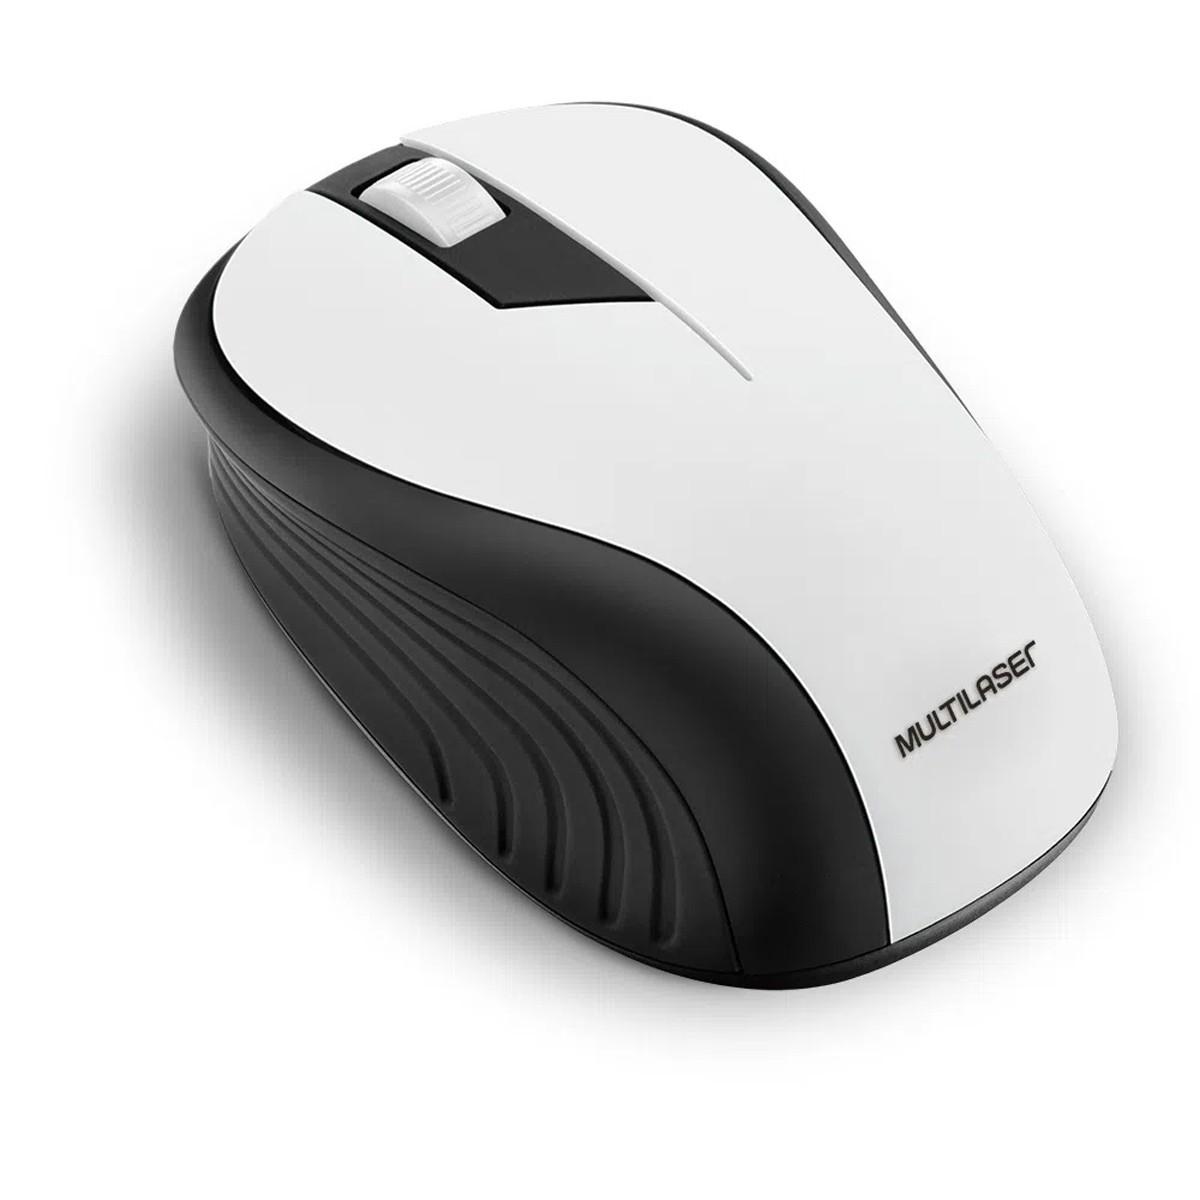 Mouse Óptico Multilaser USB Sem Fio 1200dpi - Wave MO216